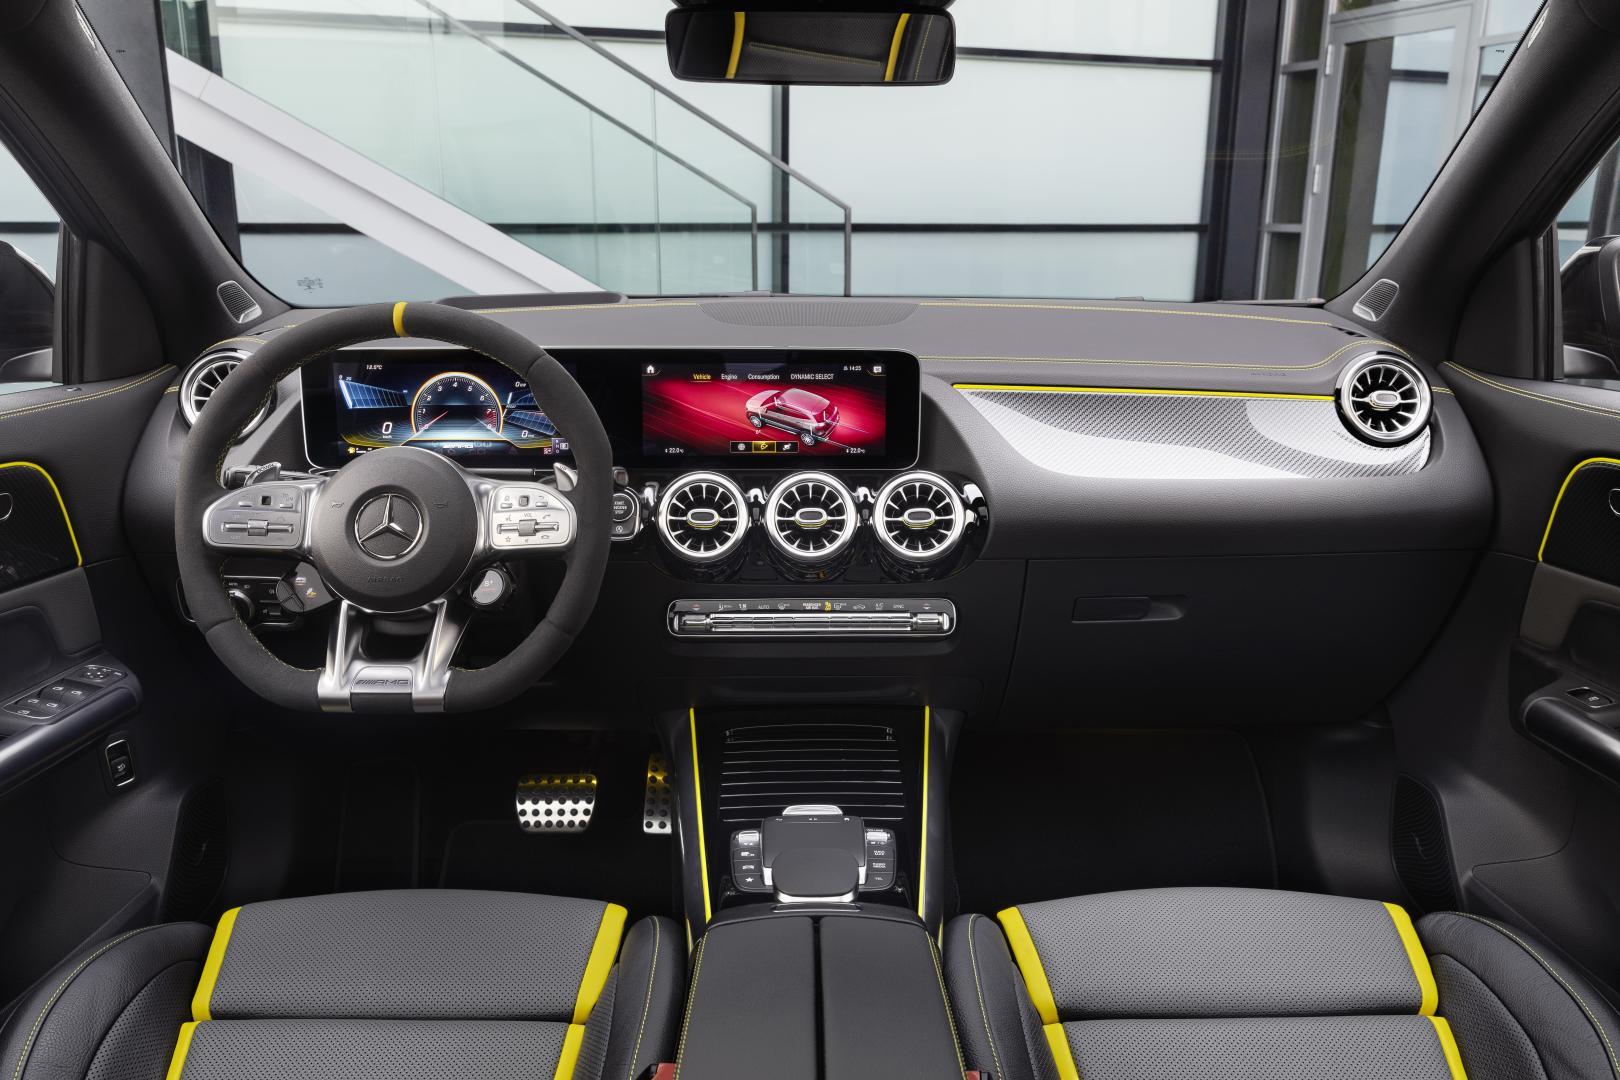 Mercedes-AMG GLA 45 S interieur